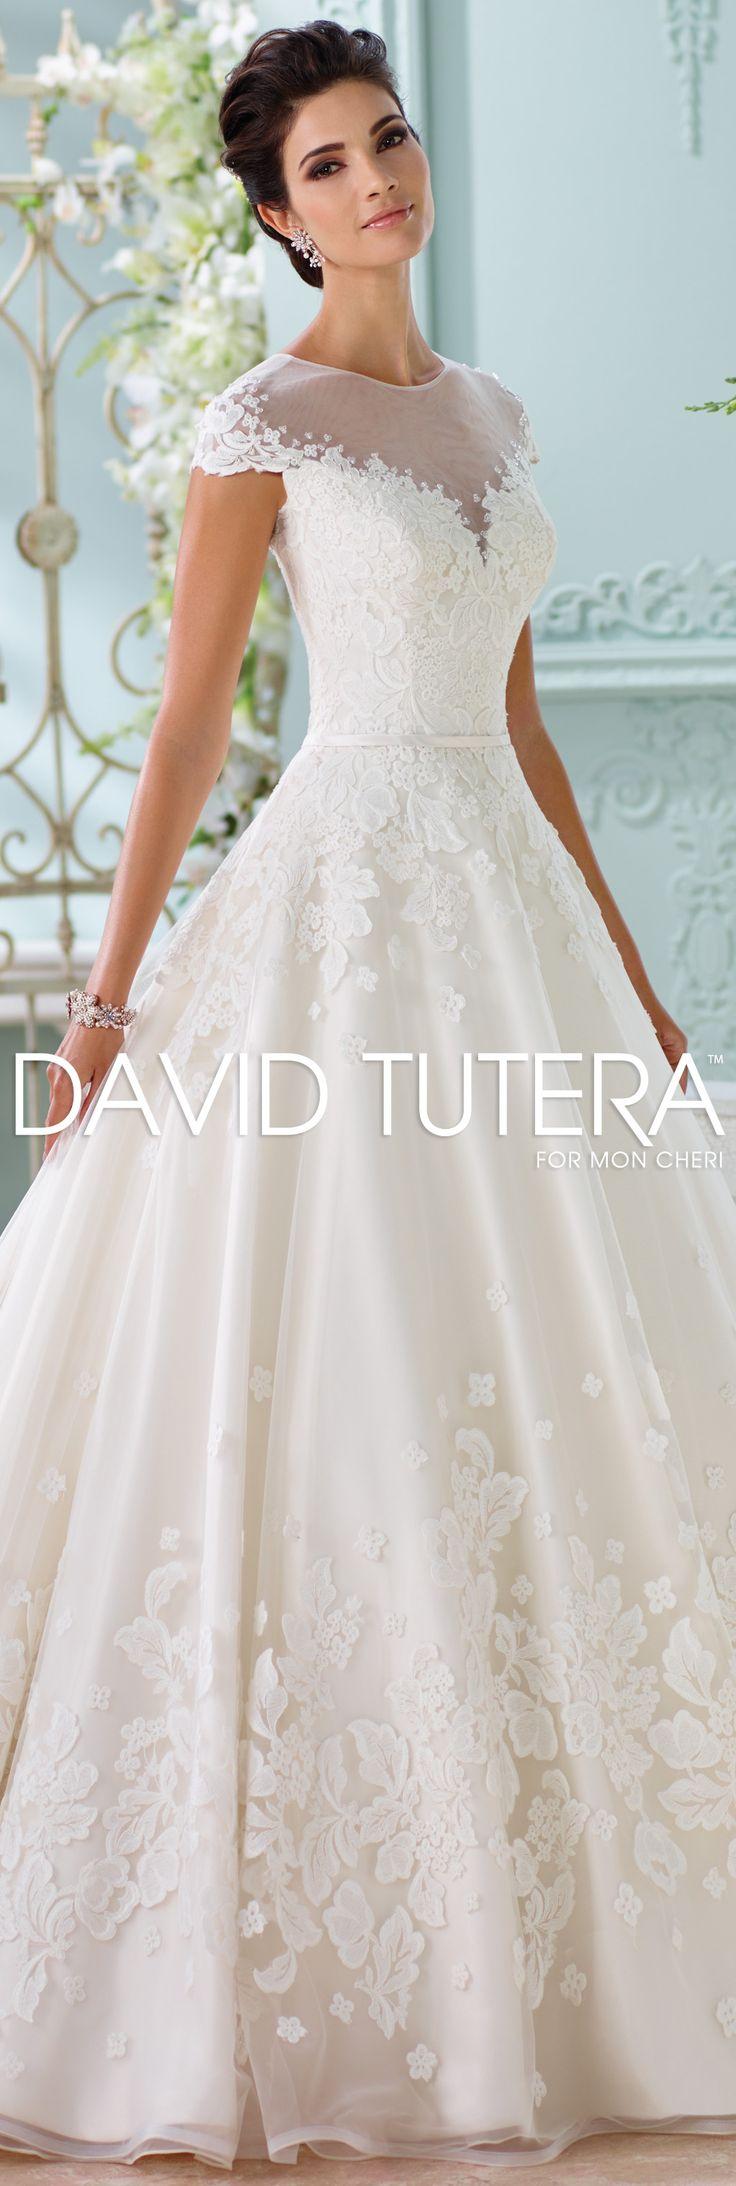 The David Tutera For Mon Cheri Spring 2016 Wedding Gown Collection